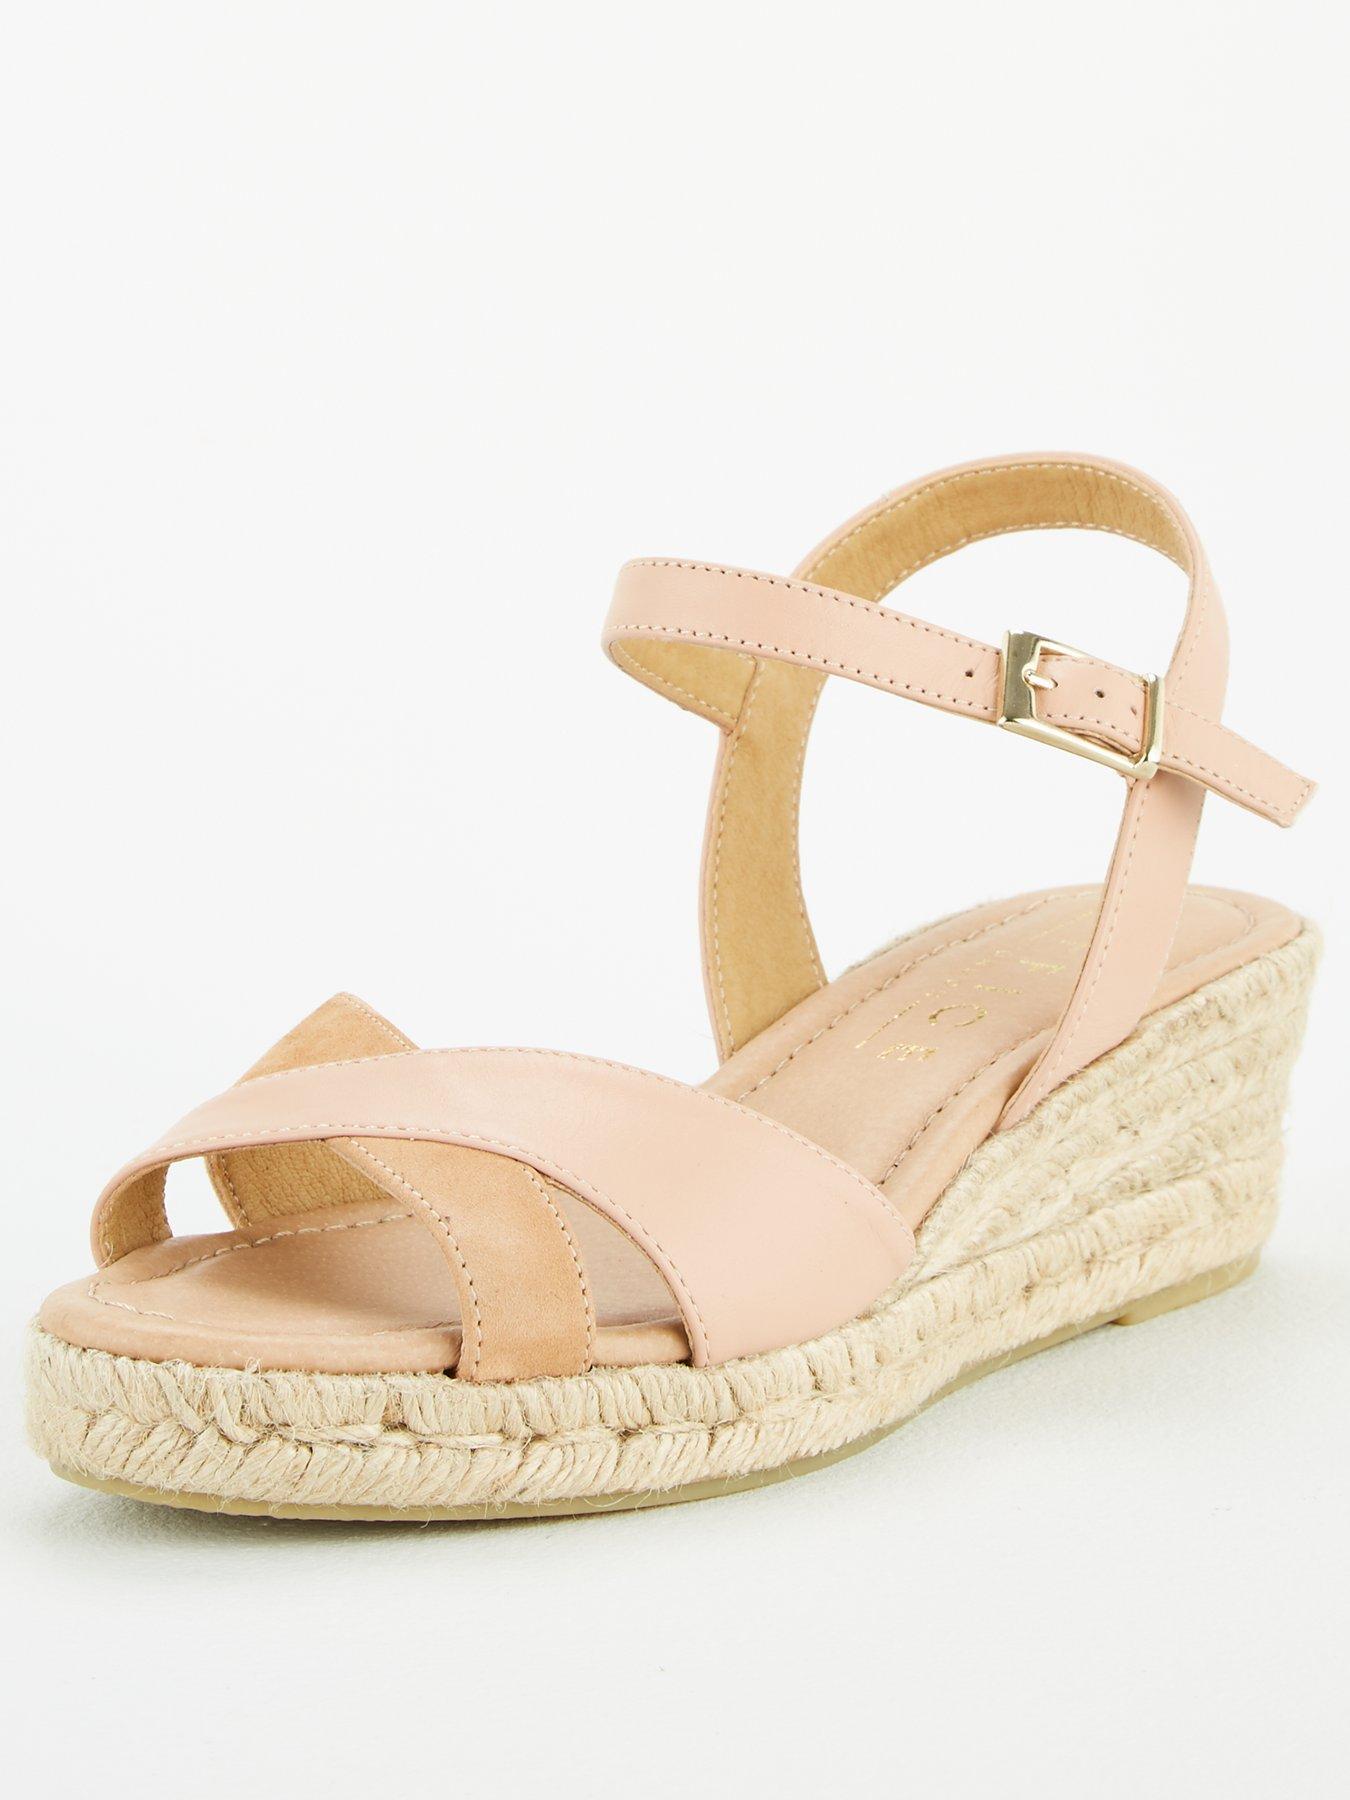 Office | Heels | Shoes \u0026 boots | Women